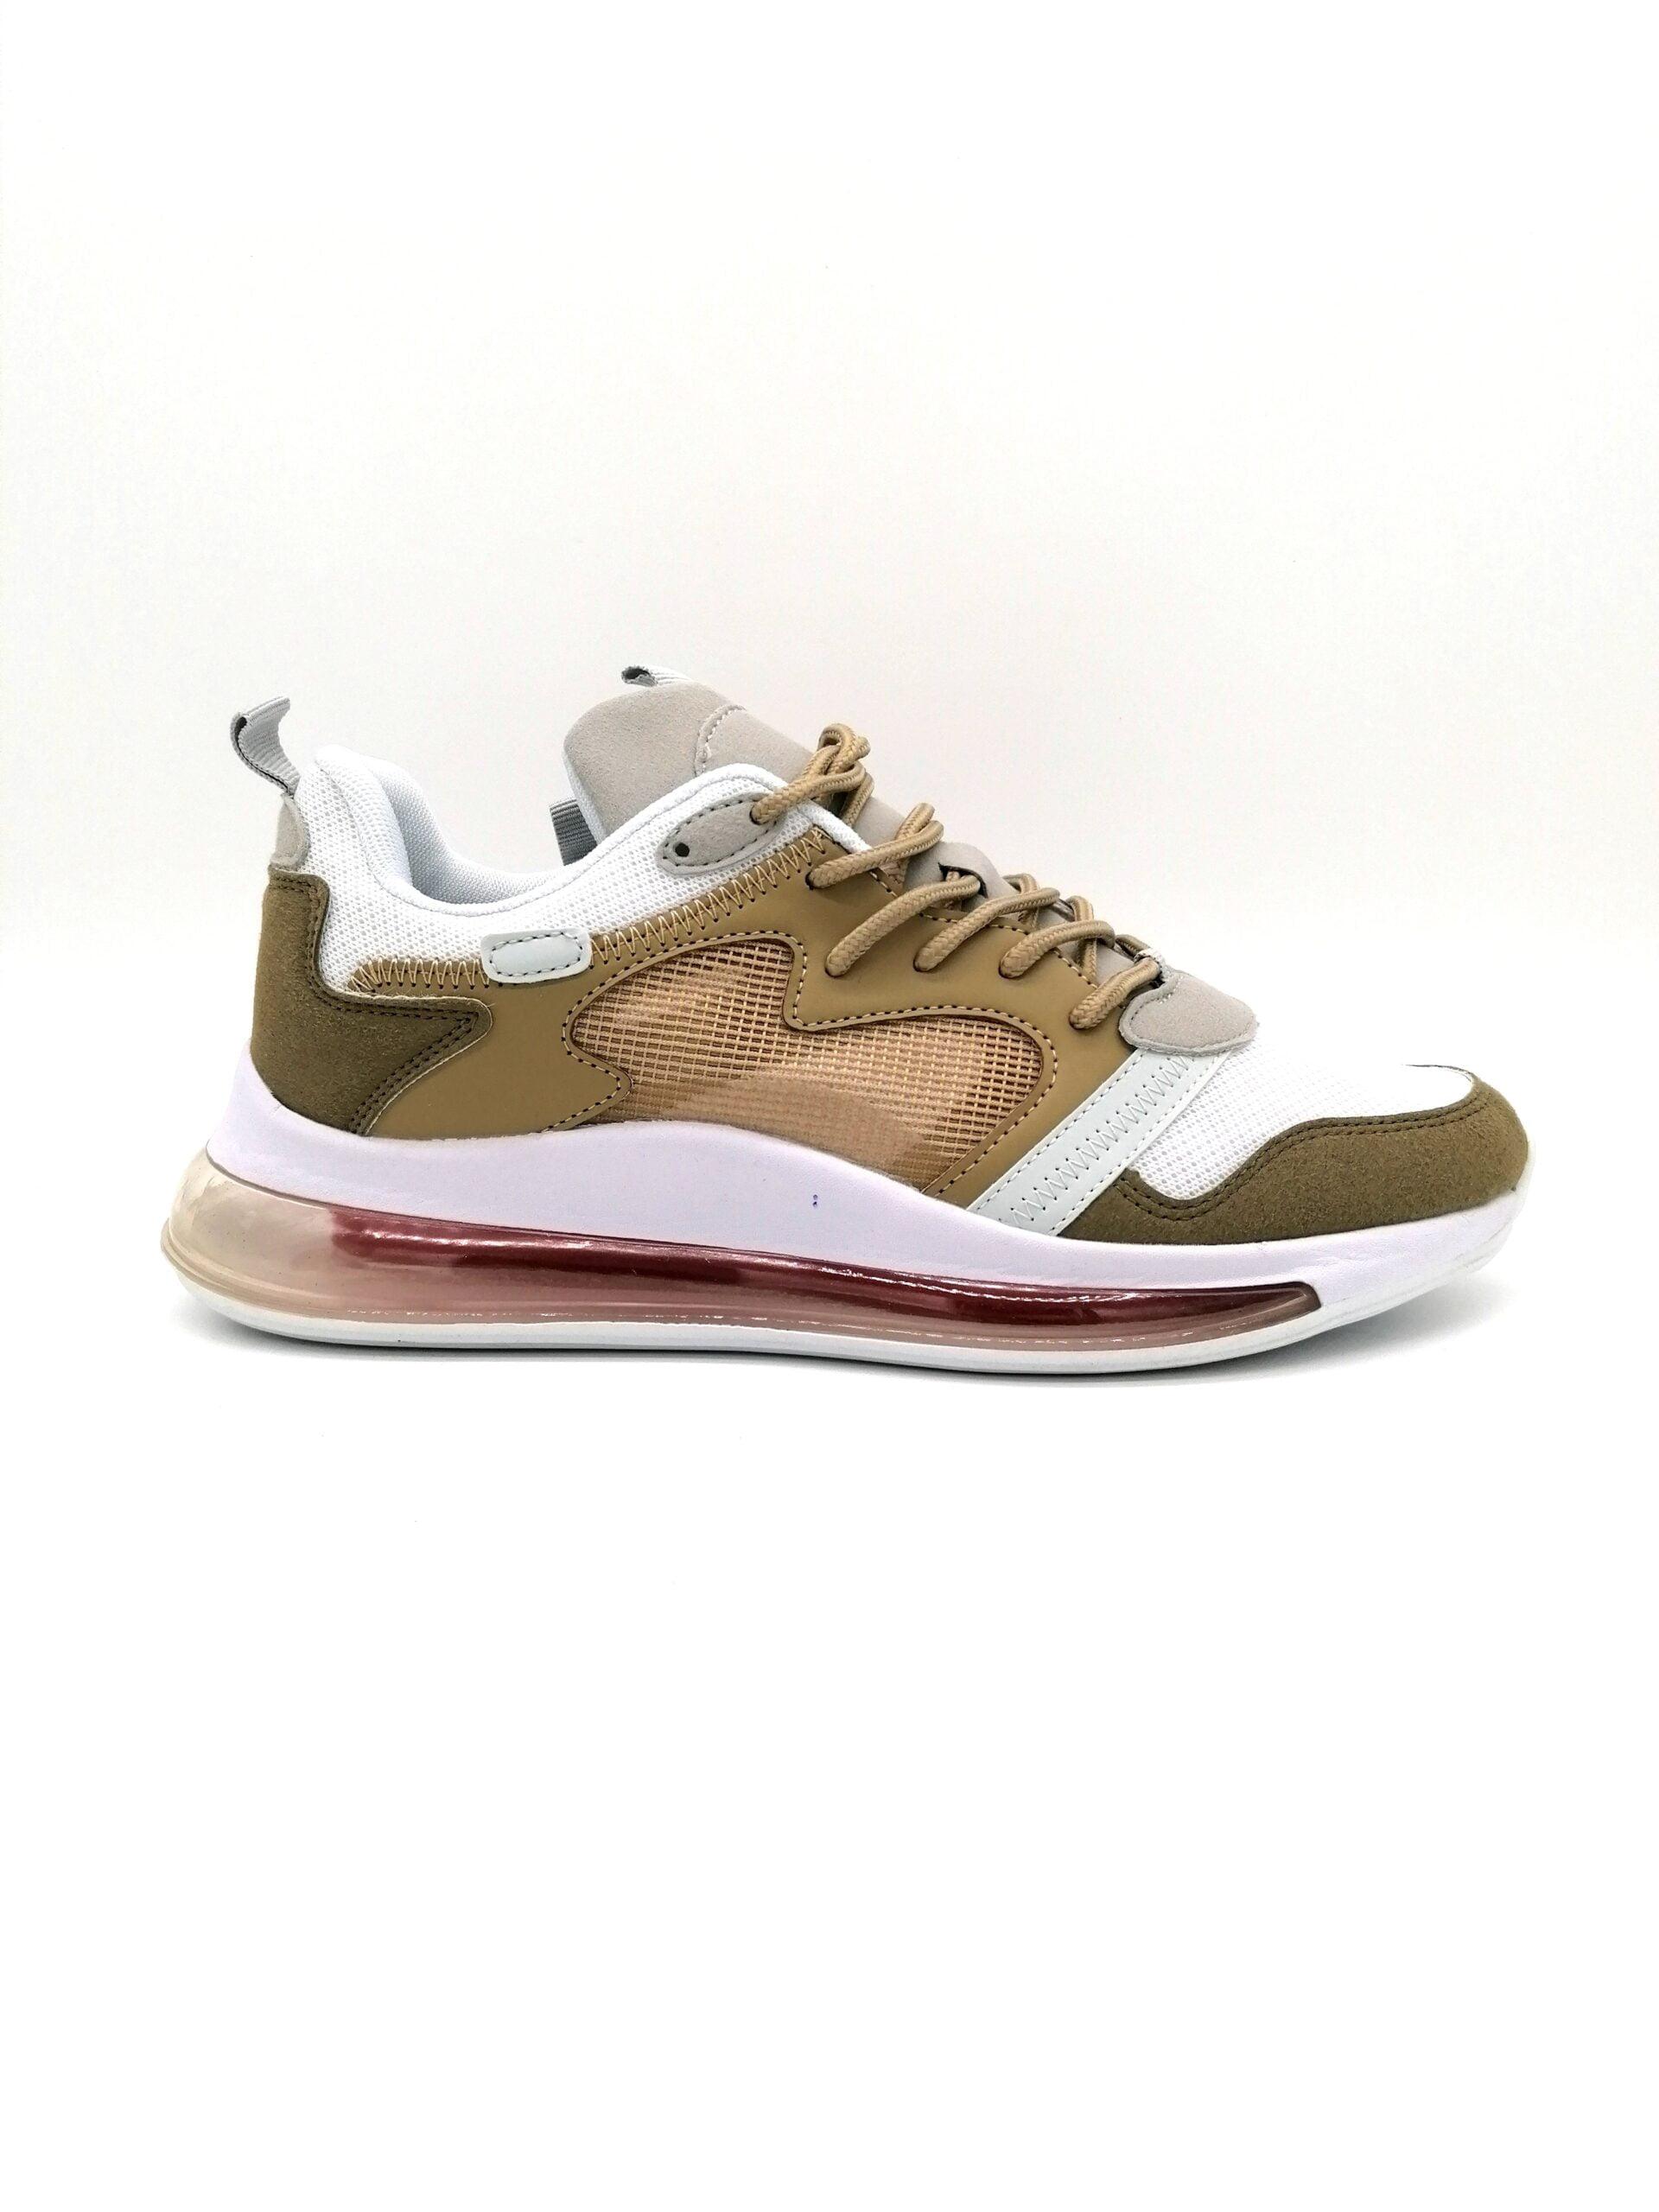 Sports shoe with a khaki airbrush